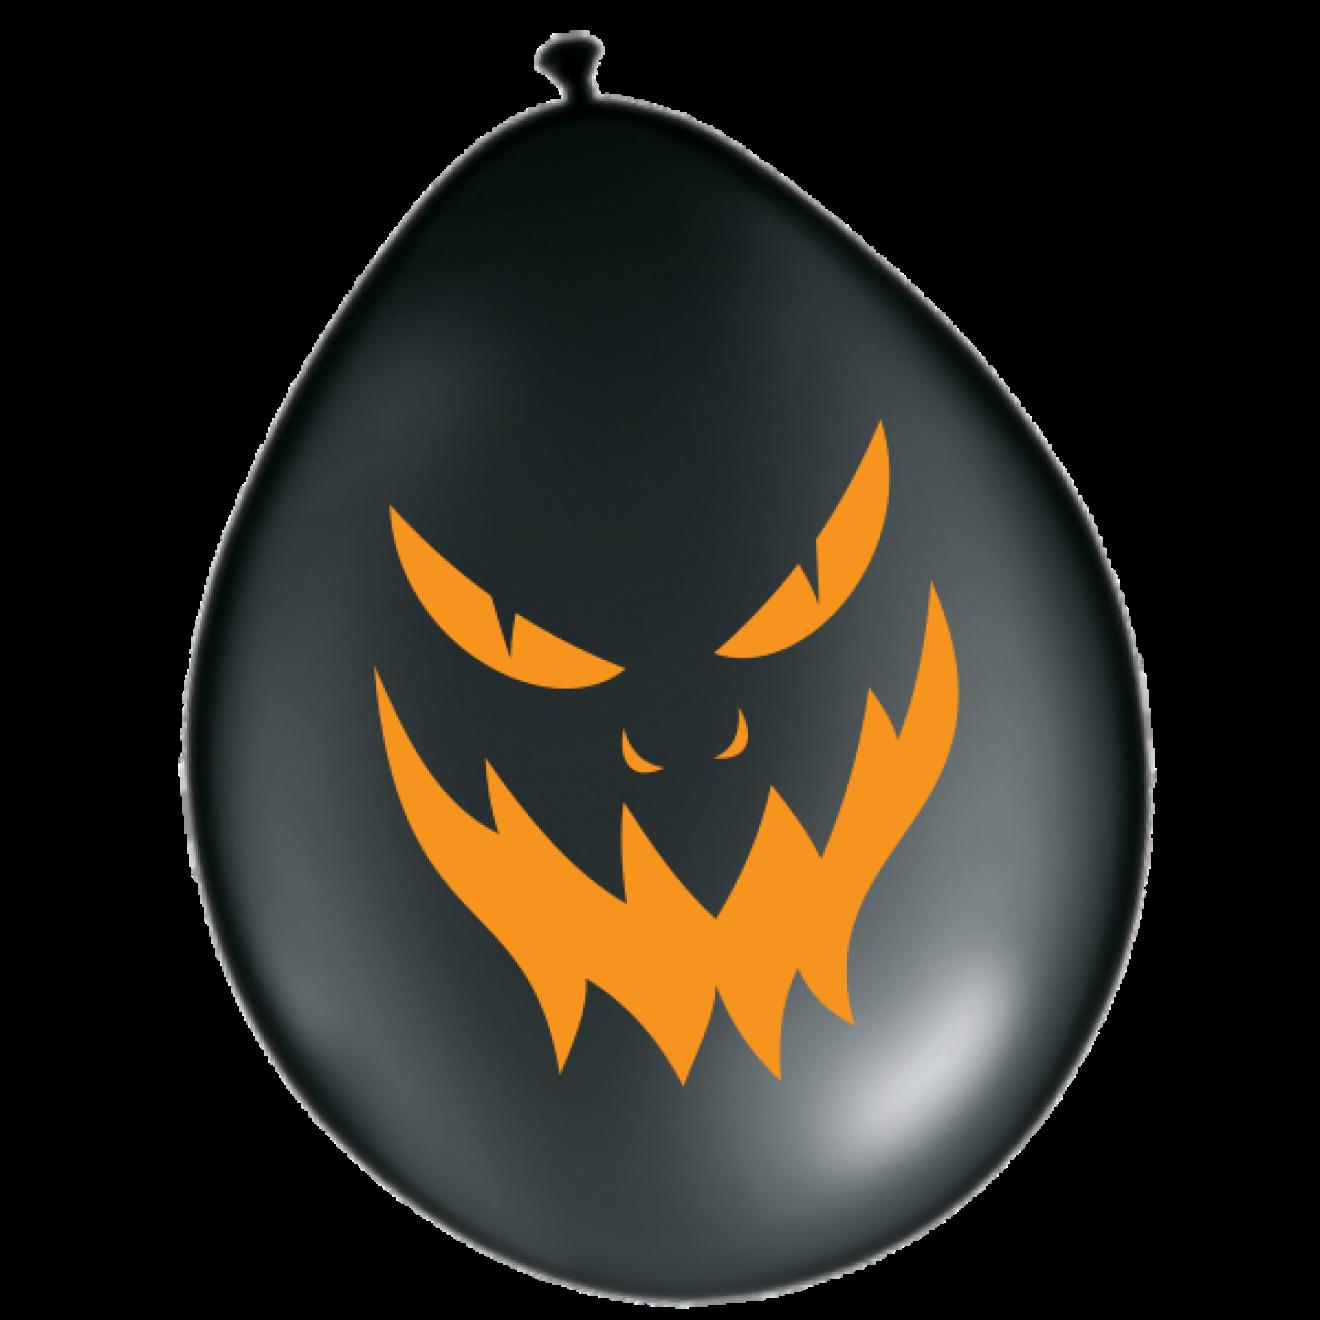 luftballons halloween b ses gesicht schwarz 30 cm. Black Bedroom Furniture Sets. Home Design Ideas